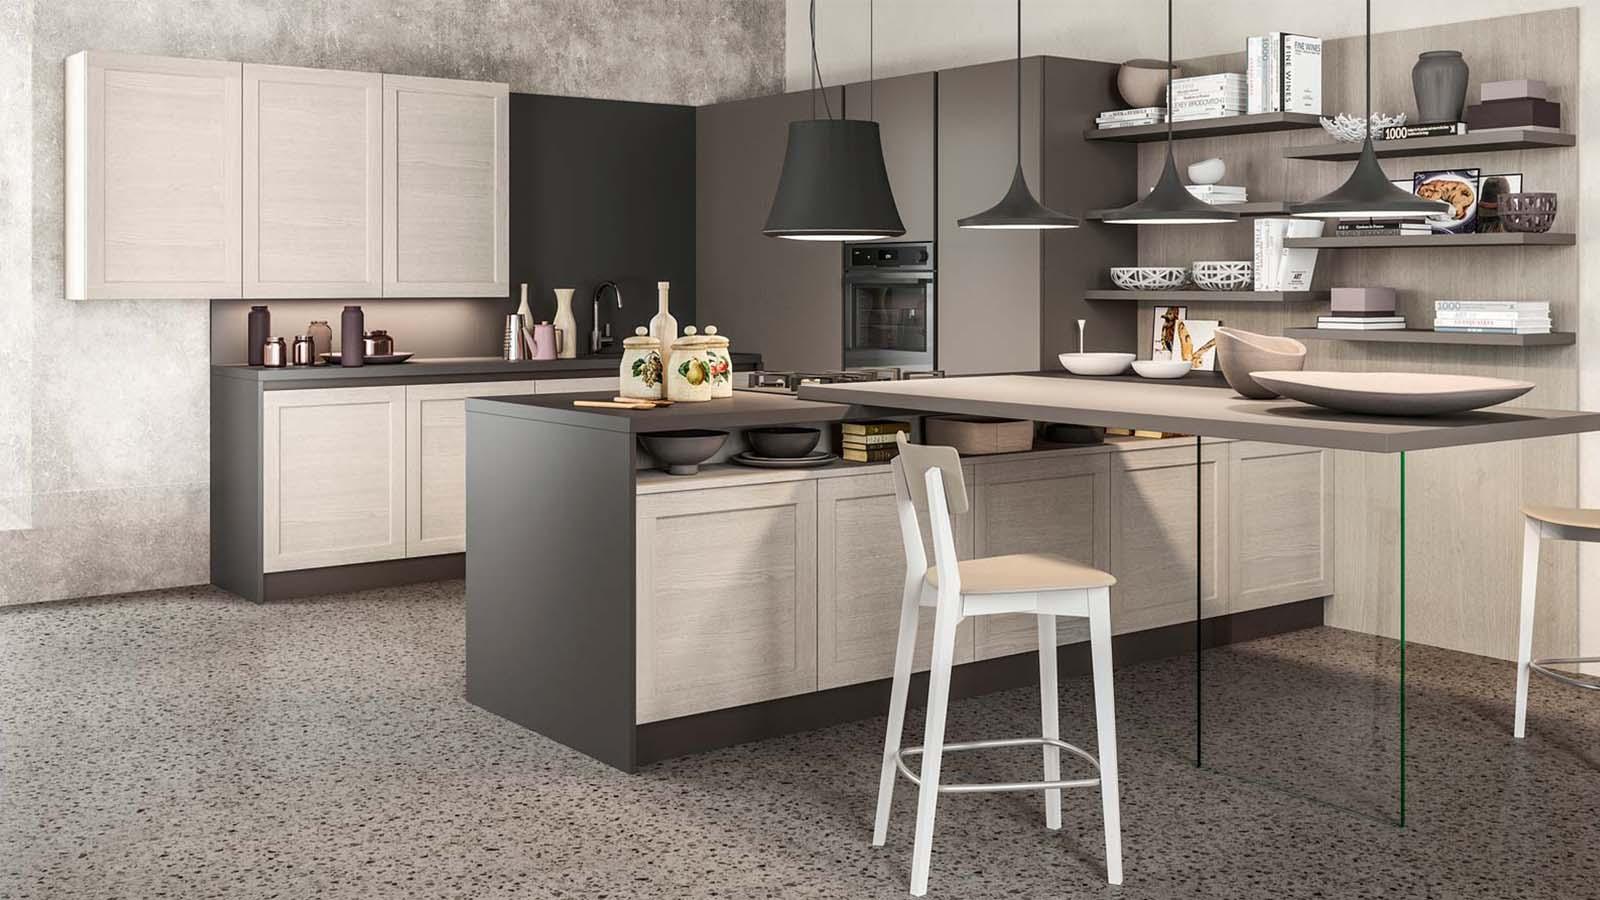 Vendita cucine padova negozio di arredamento cucine for Cucina moderna 2018 pdf